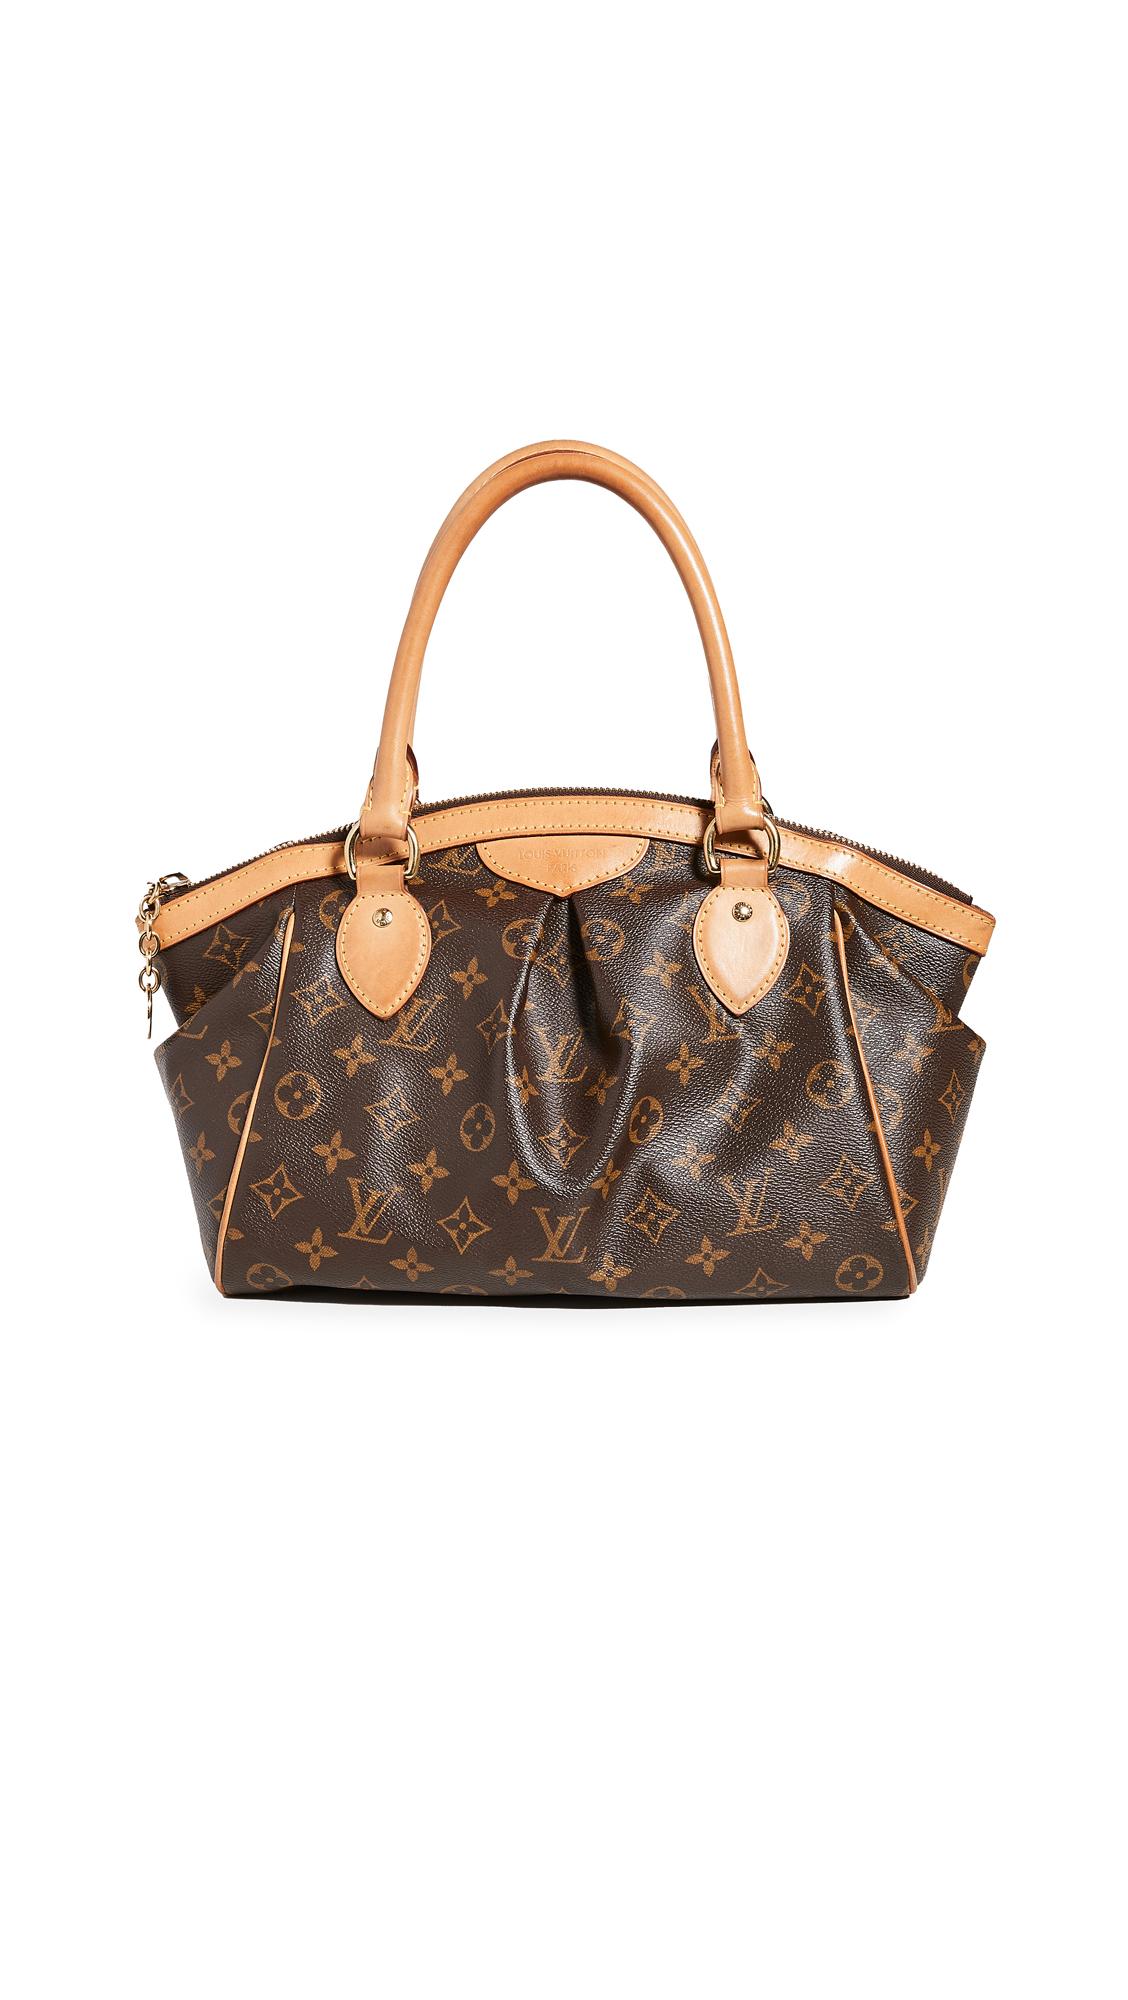 Shopbop Archive Louis Vuitton Tivoli PM Monogram Bag